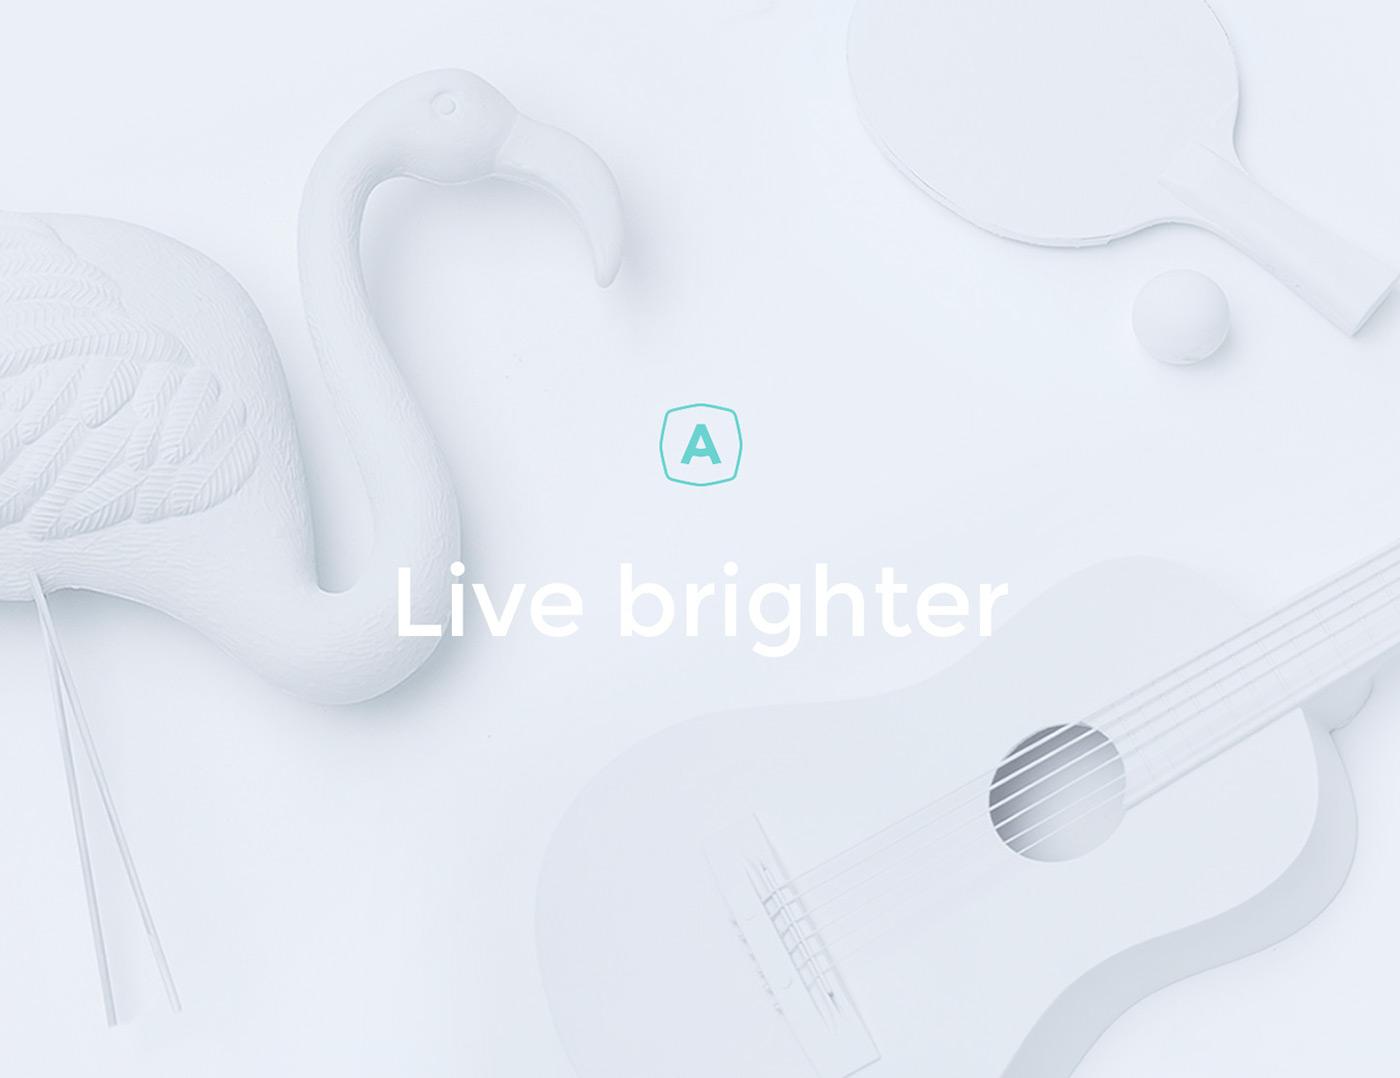 avenir L'Avenir clinic dental dental clinic dentist Clinique Dentaire White bright white on white interactive turquoise Web Montreal